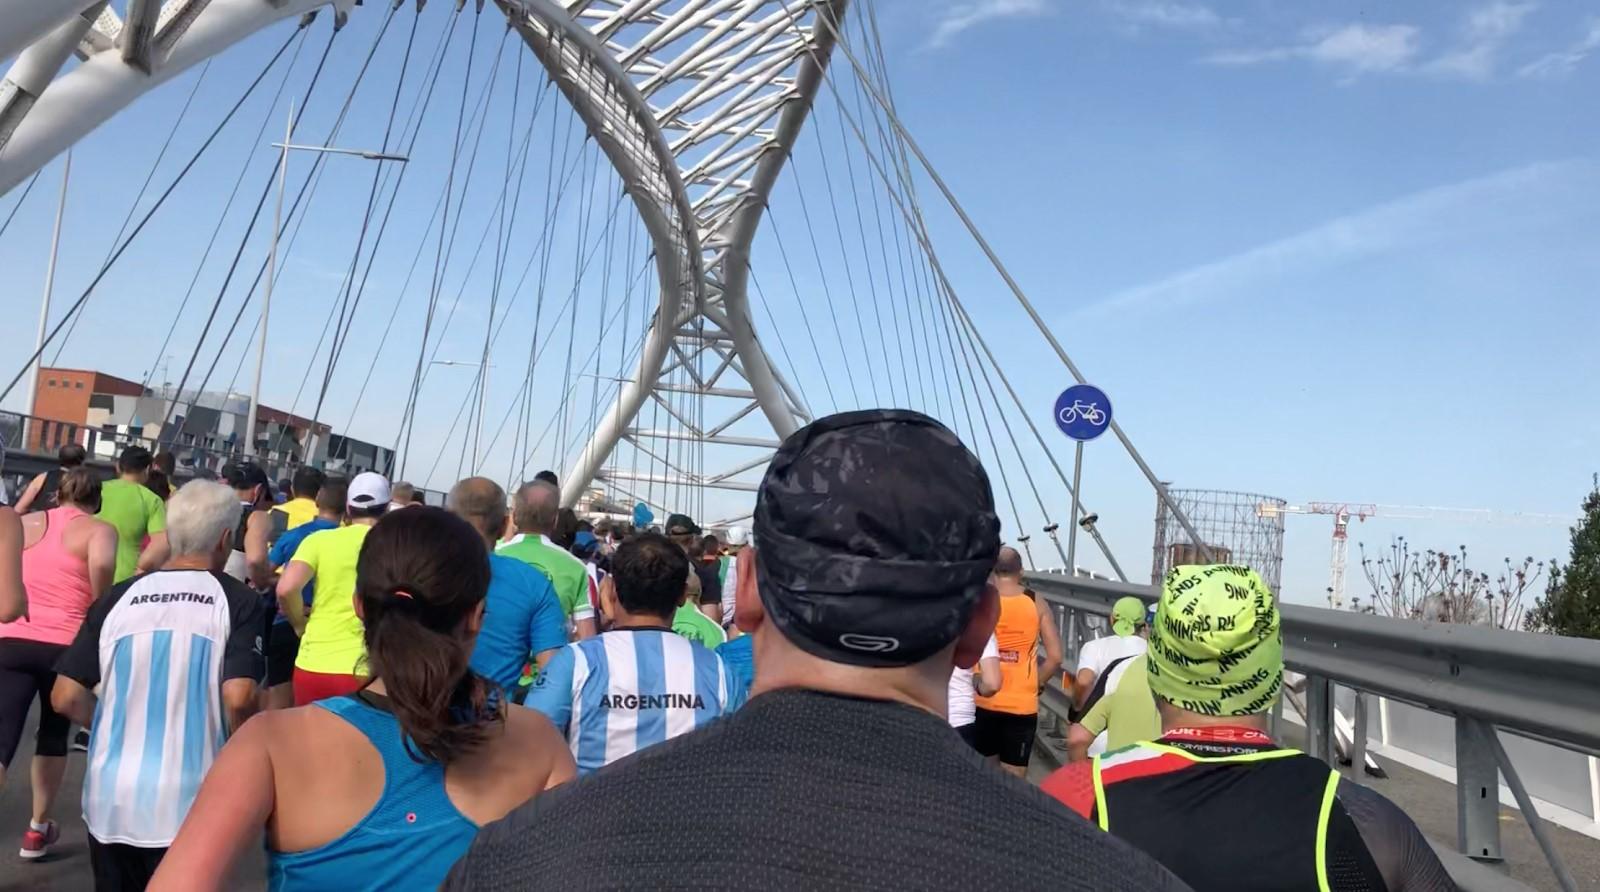 [Хабра-оффтоп] Maratona di Roma, или первый марафон для ИТ-шника - 18